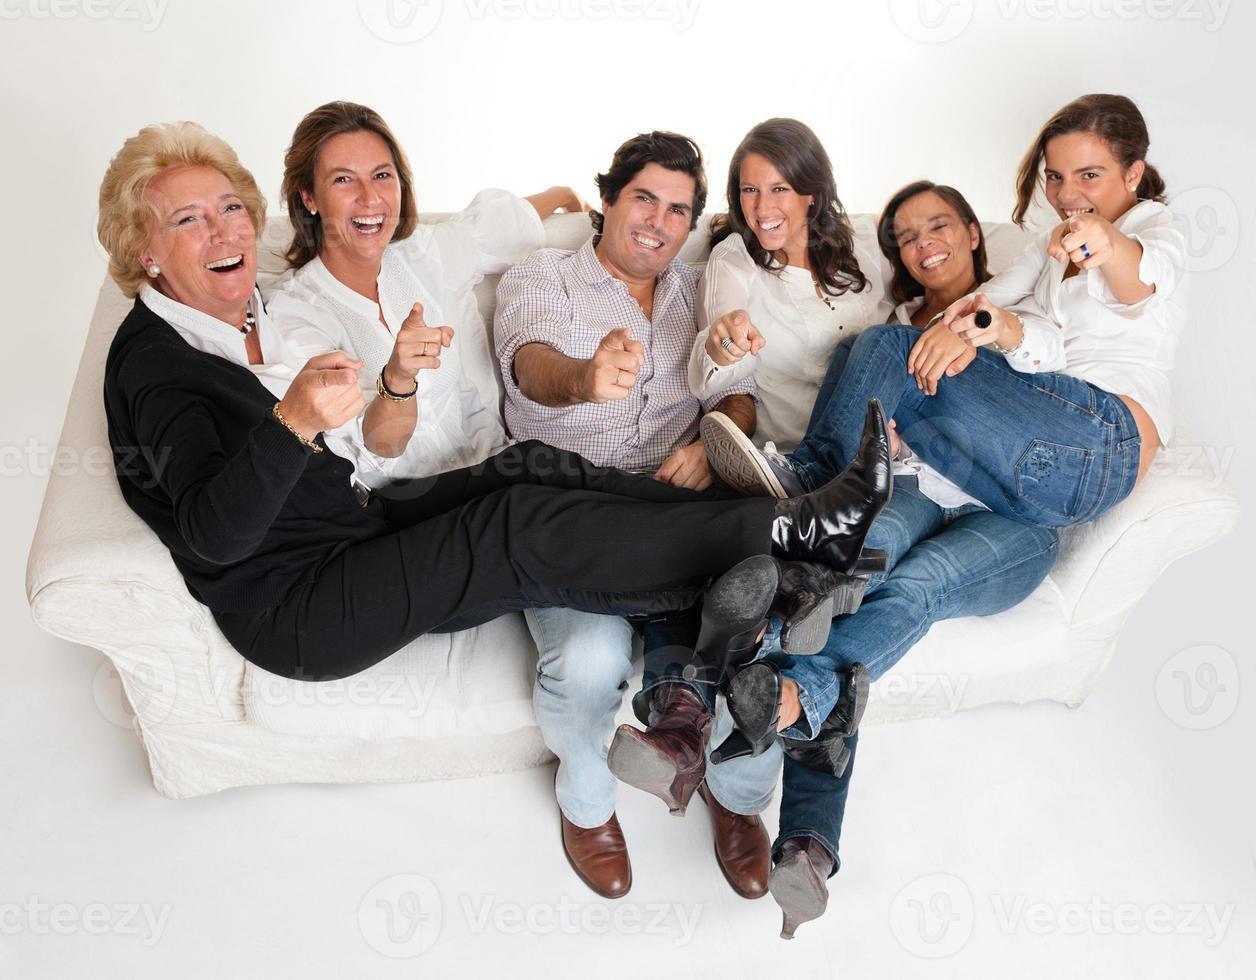 família rindo foto